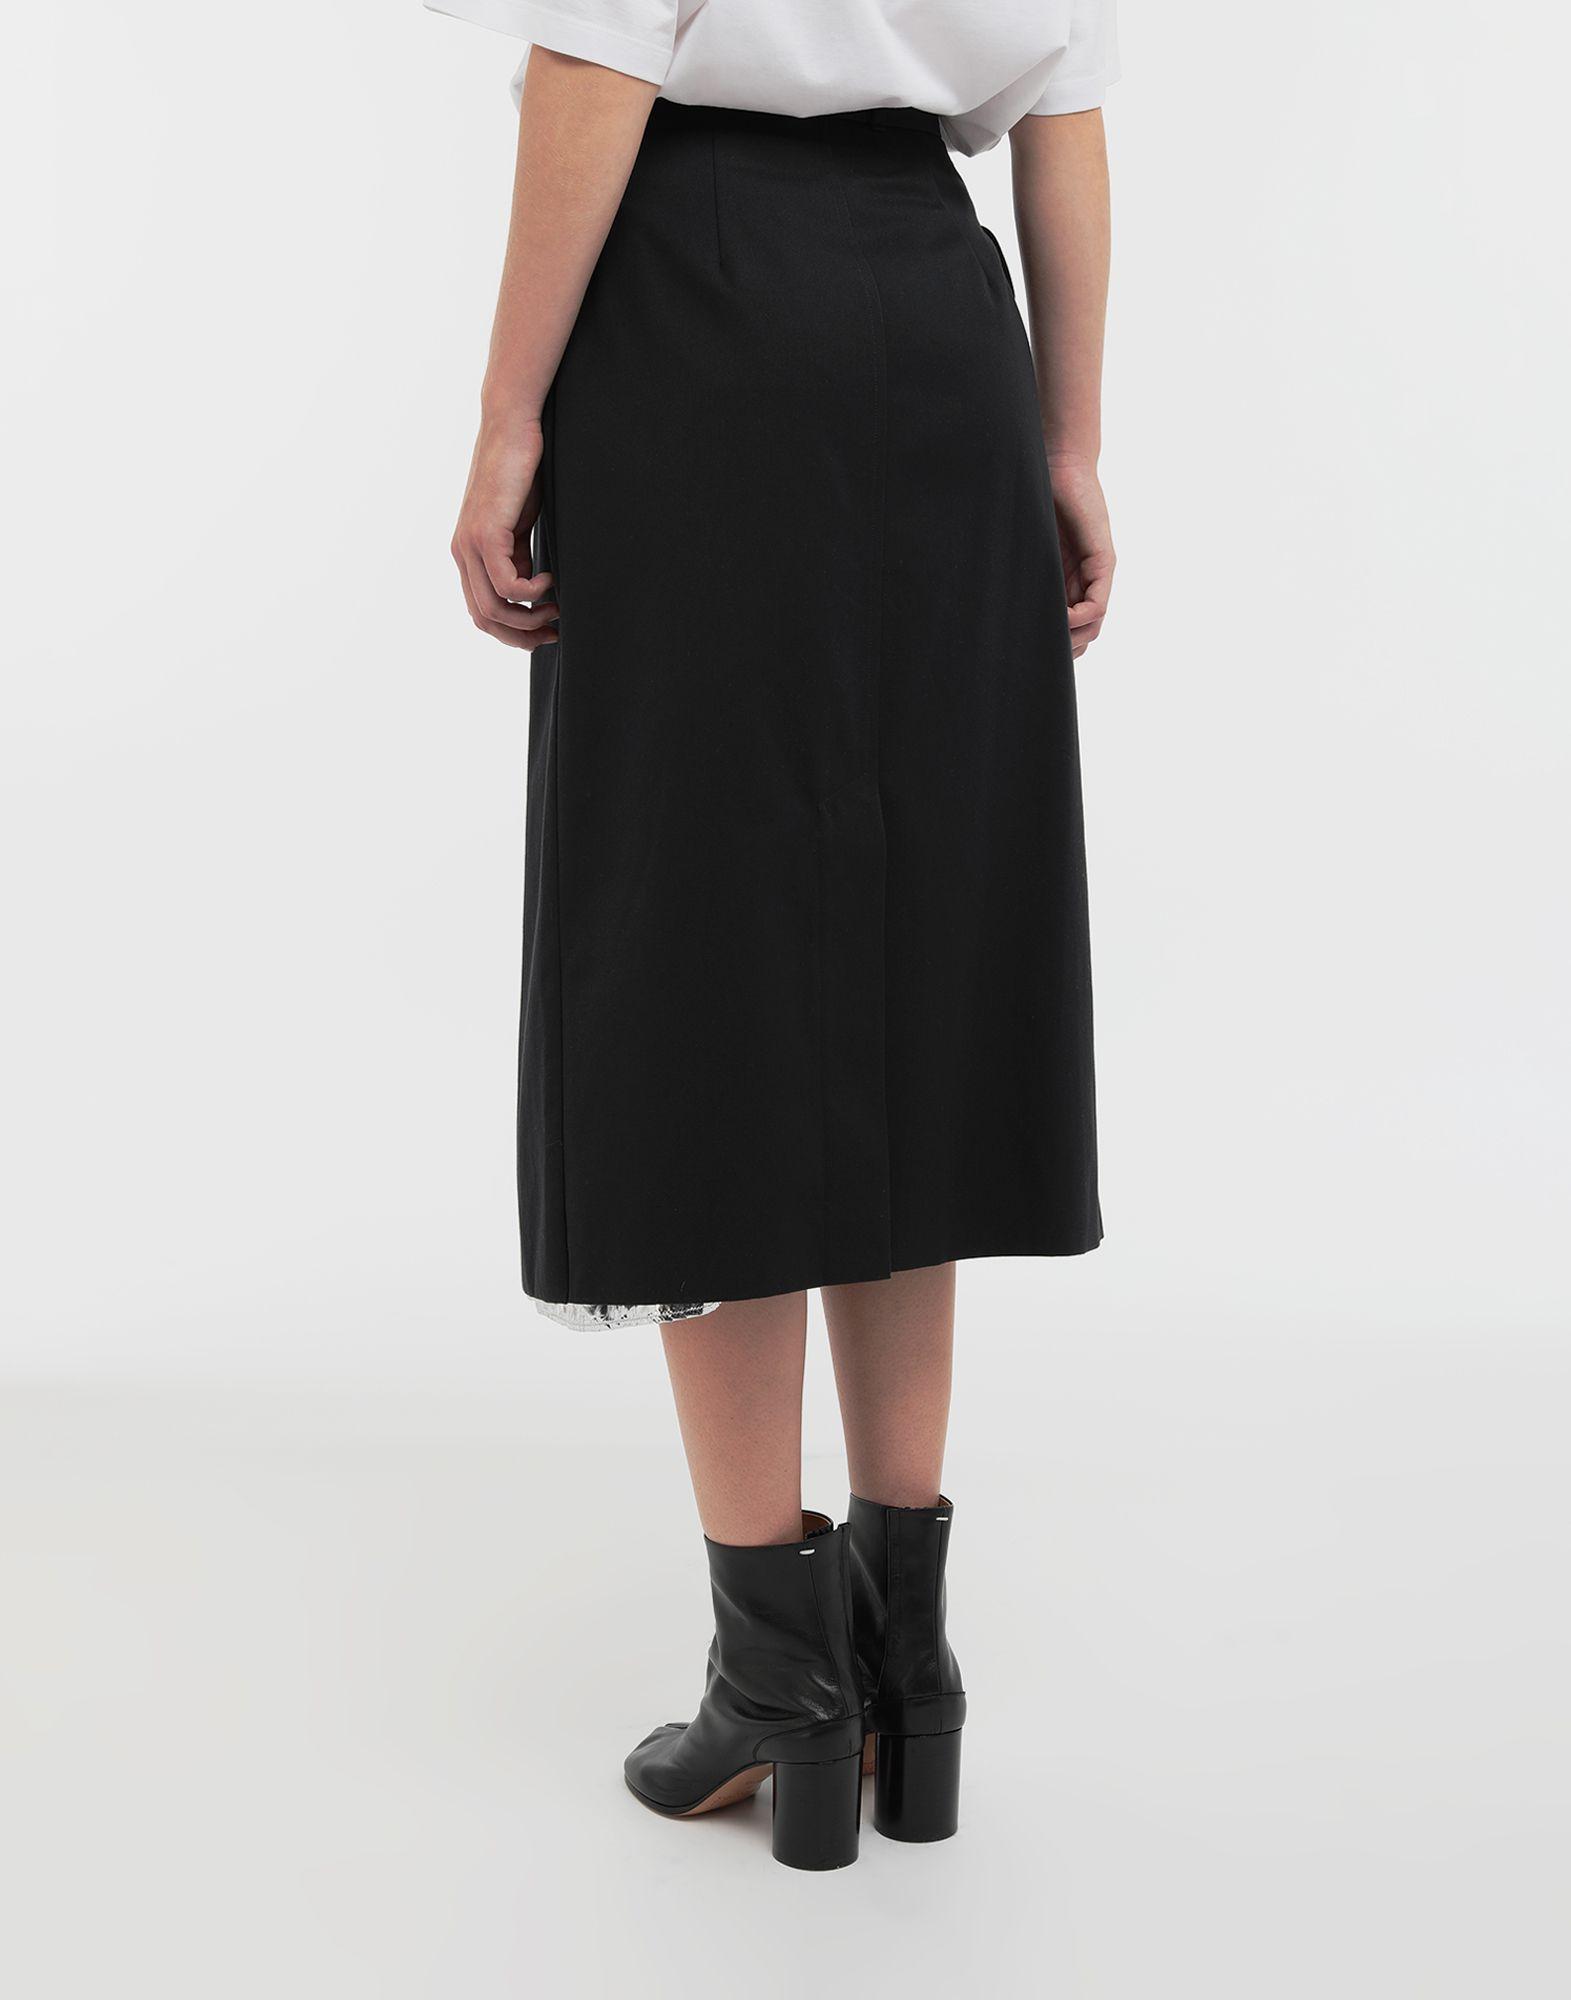 MAISON MARGIELA Double layer cotton-blend midi skirt 3/4 length skirt Woman e